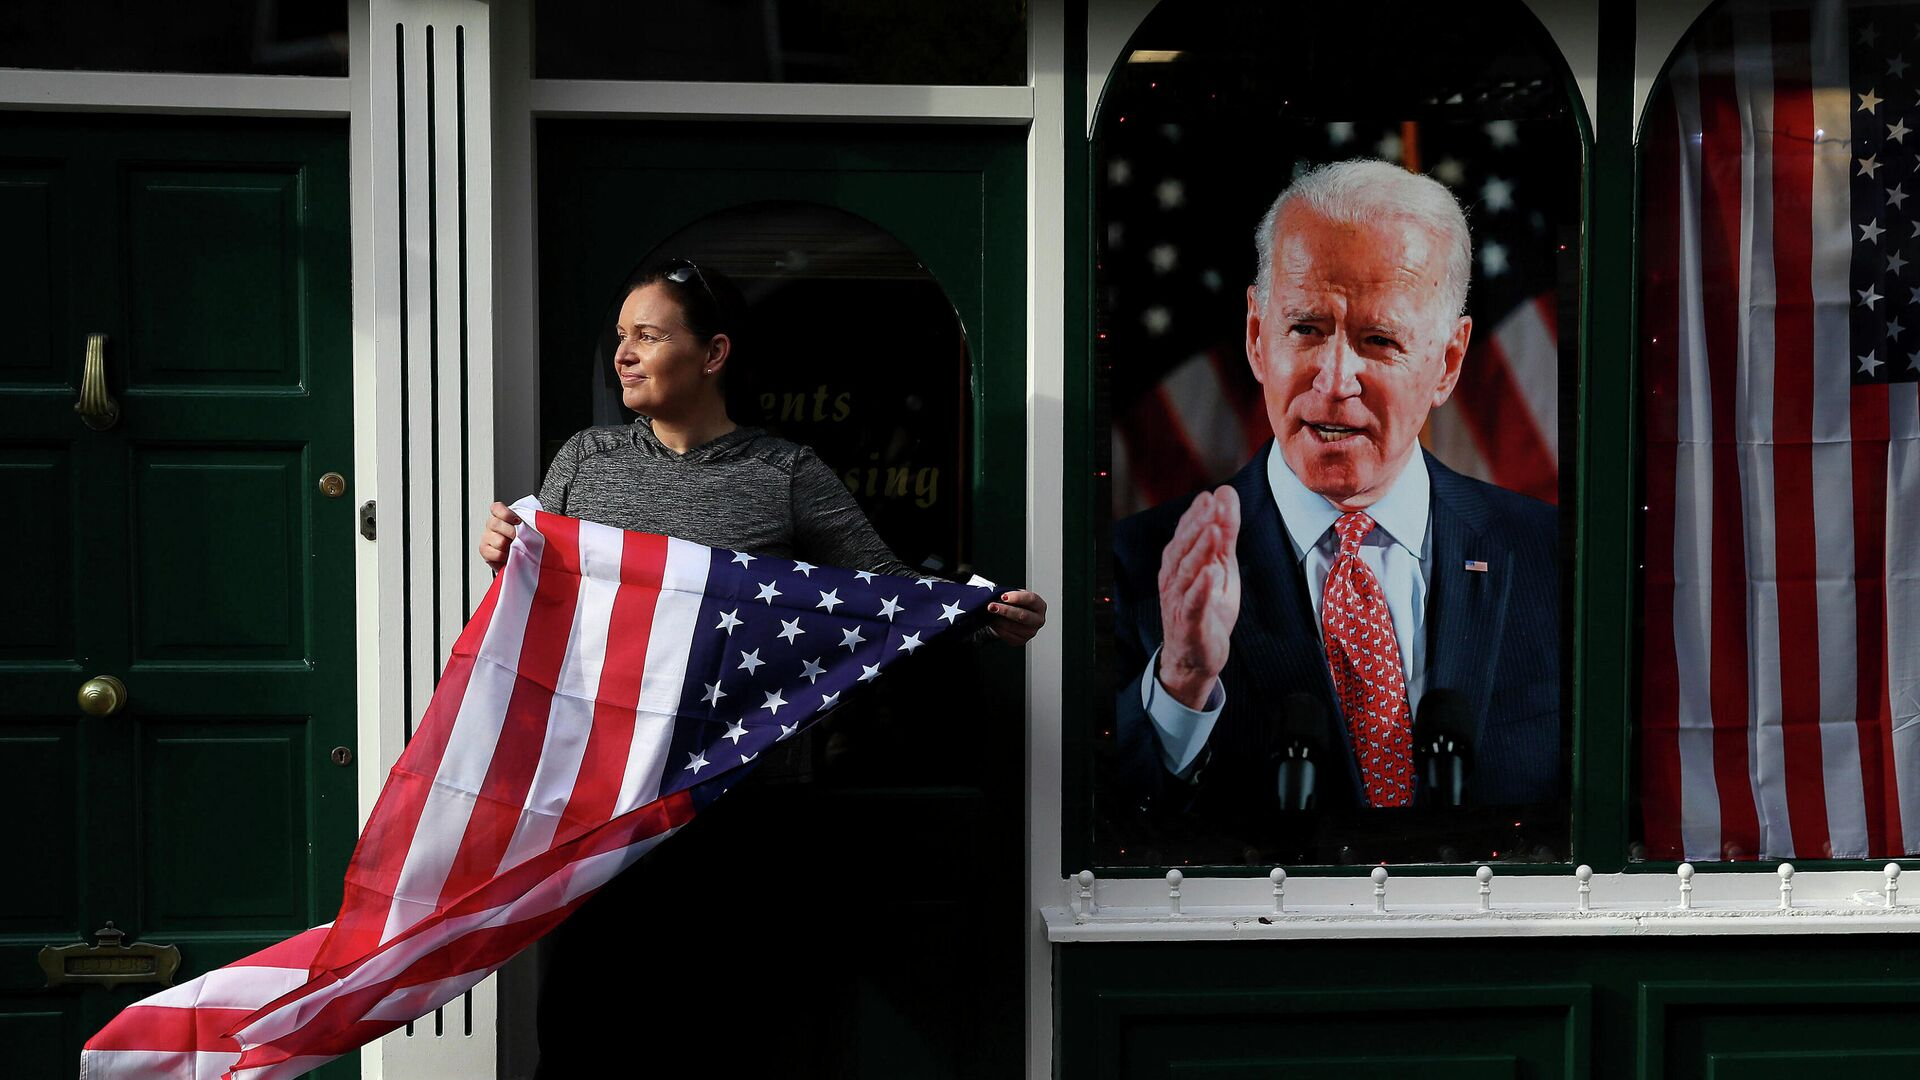 Сторонница Джо Байдена с флагом США на улице города Баллина, Ирландия - РИА Новости, 1920, 07.11.2020